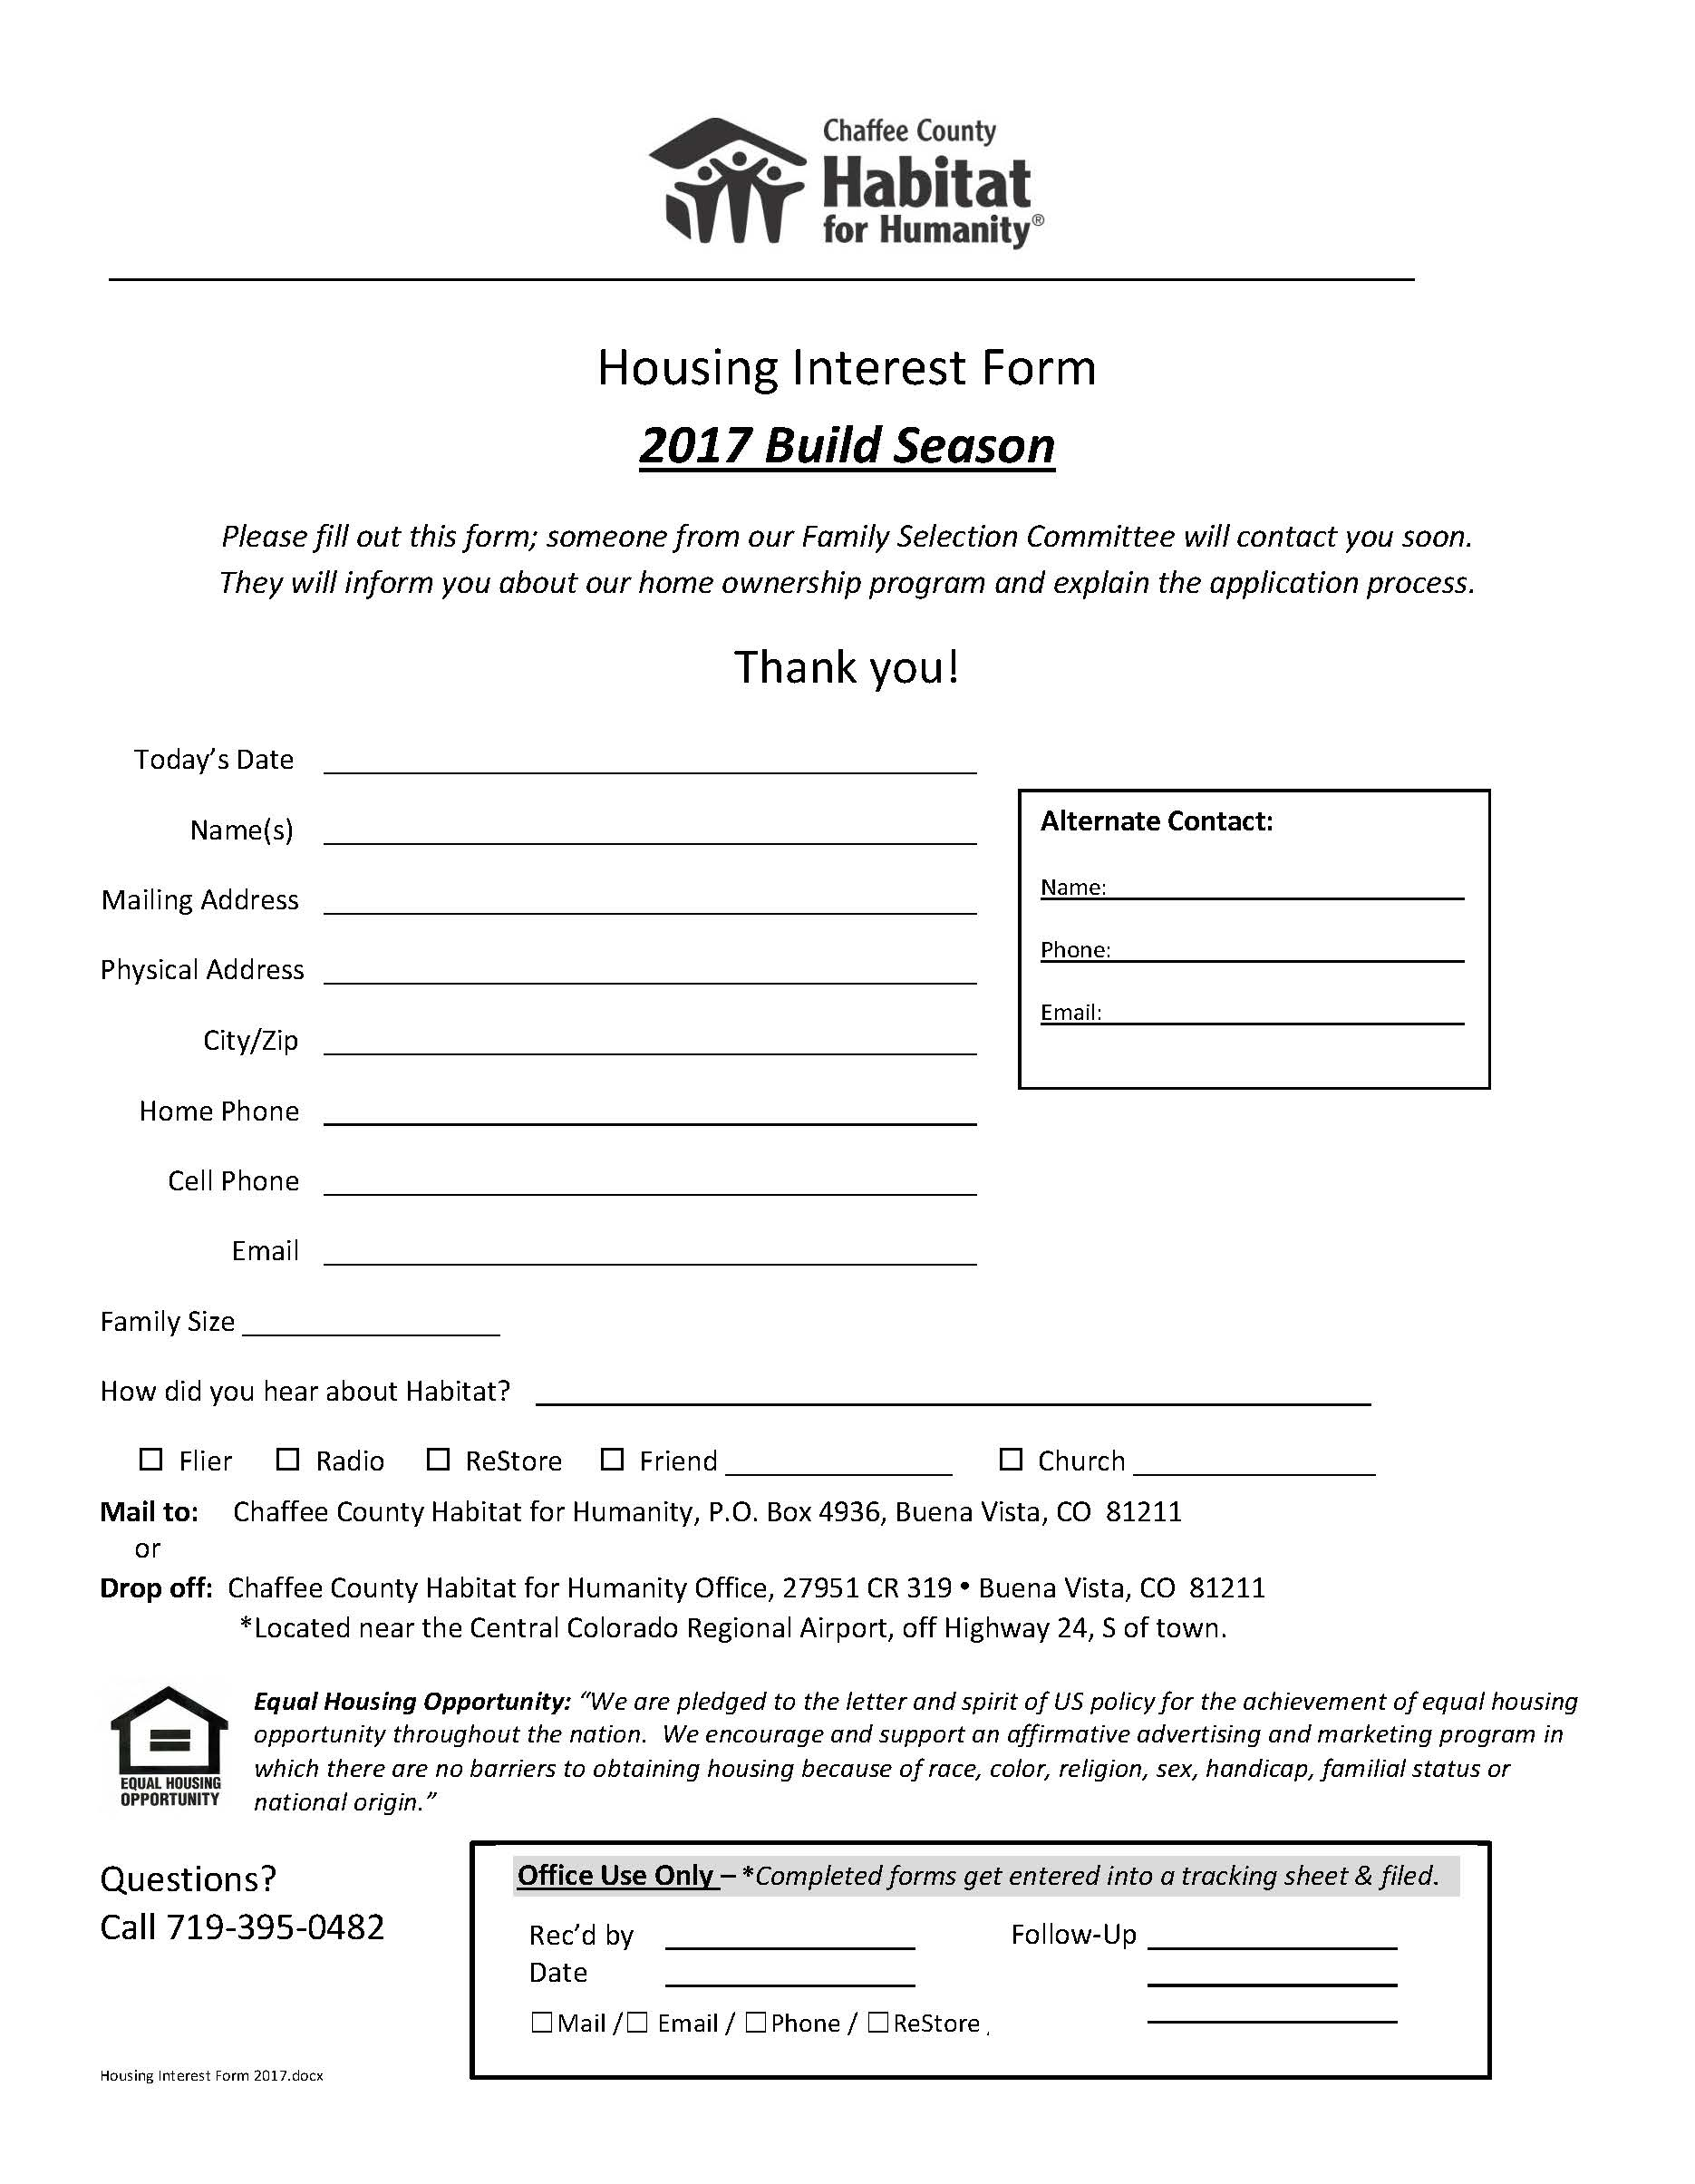 Housing Interest Form 2017